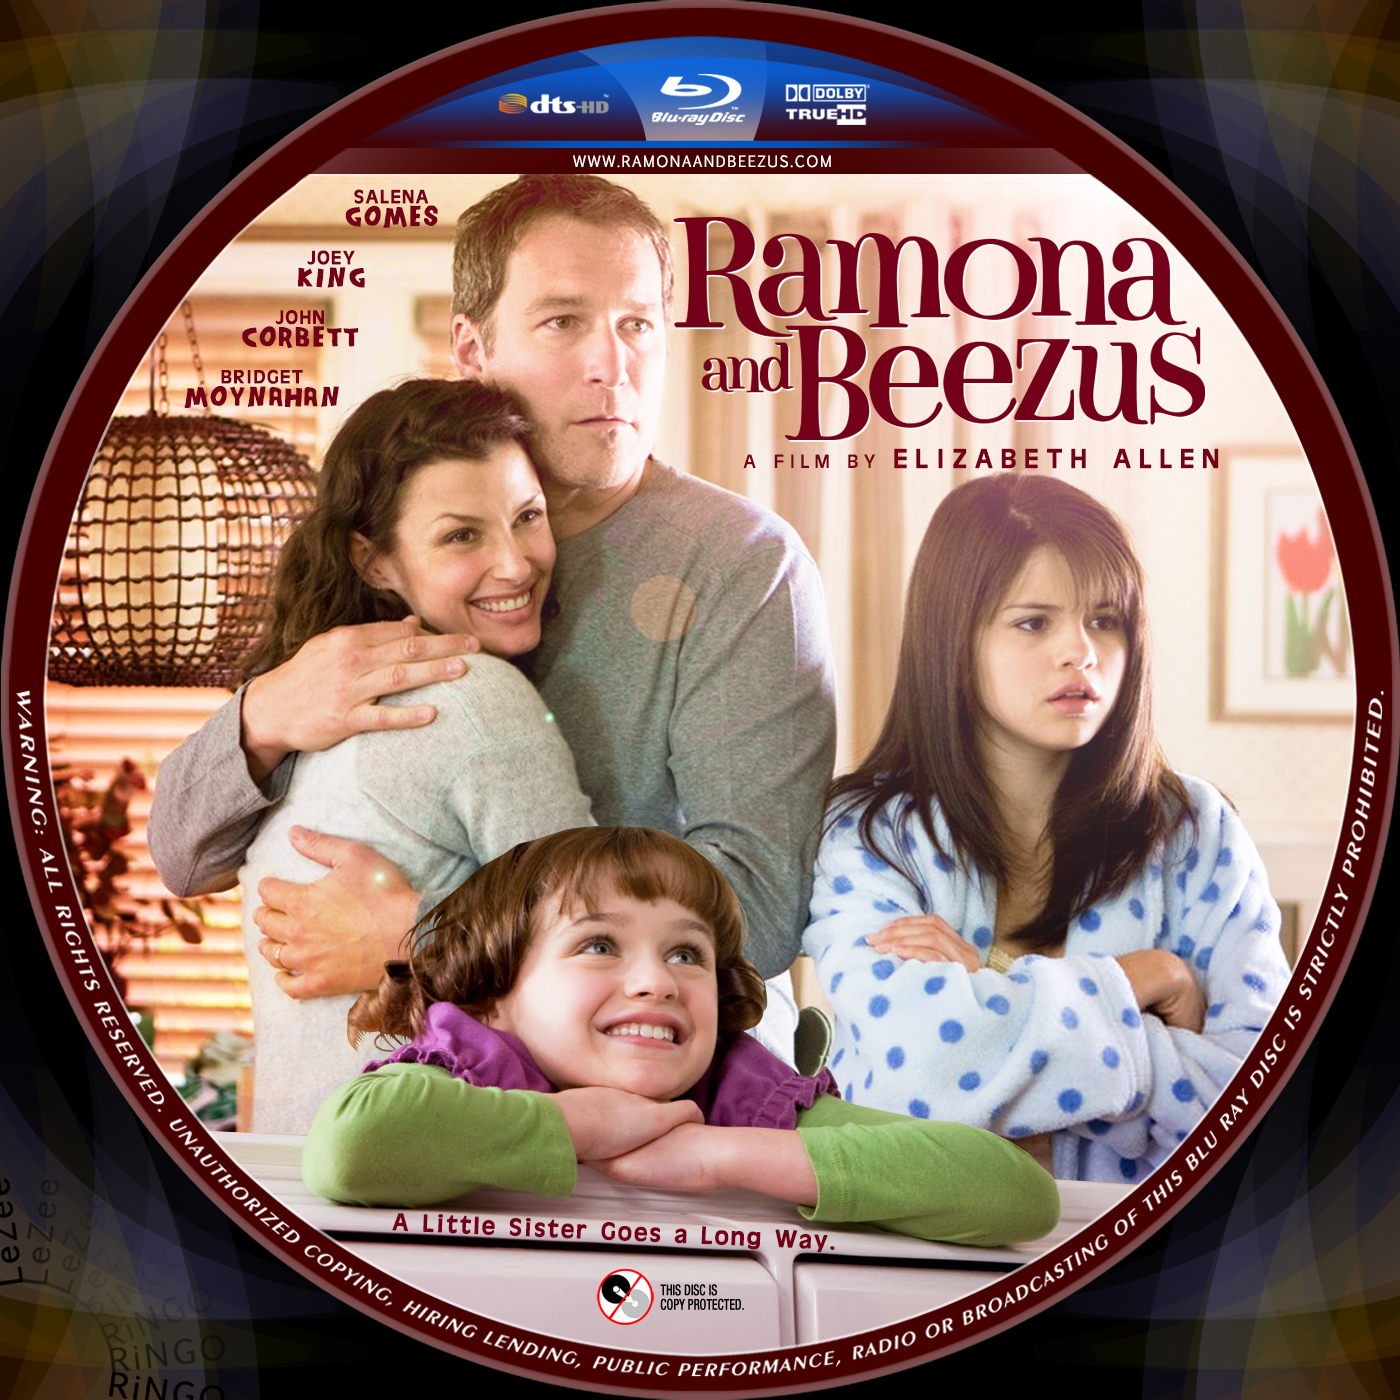 FILME & BEEZUS RAMONA BAIXAR O